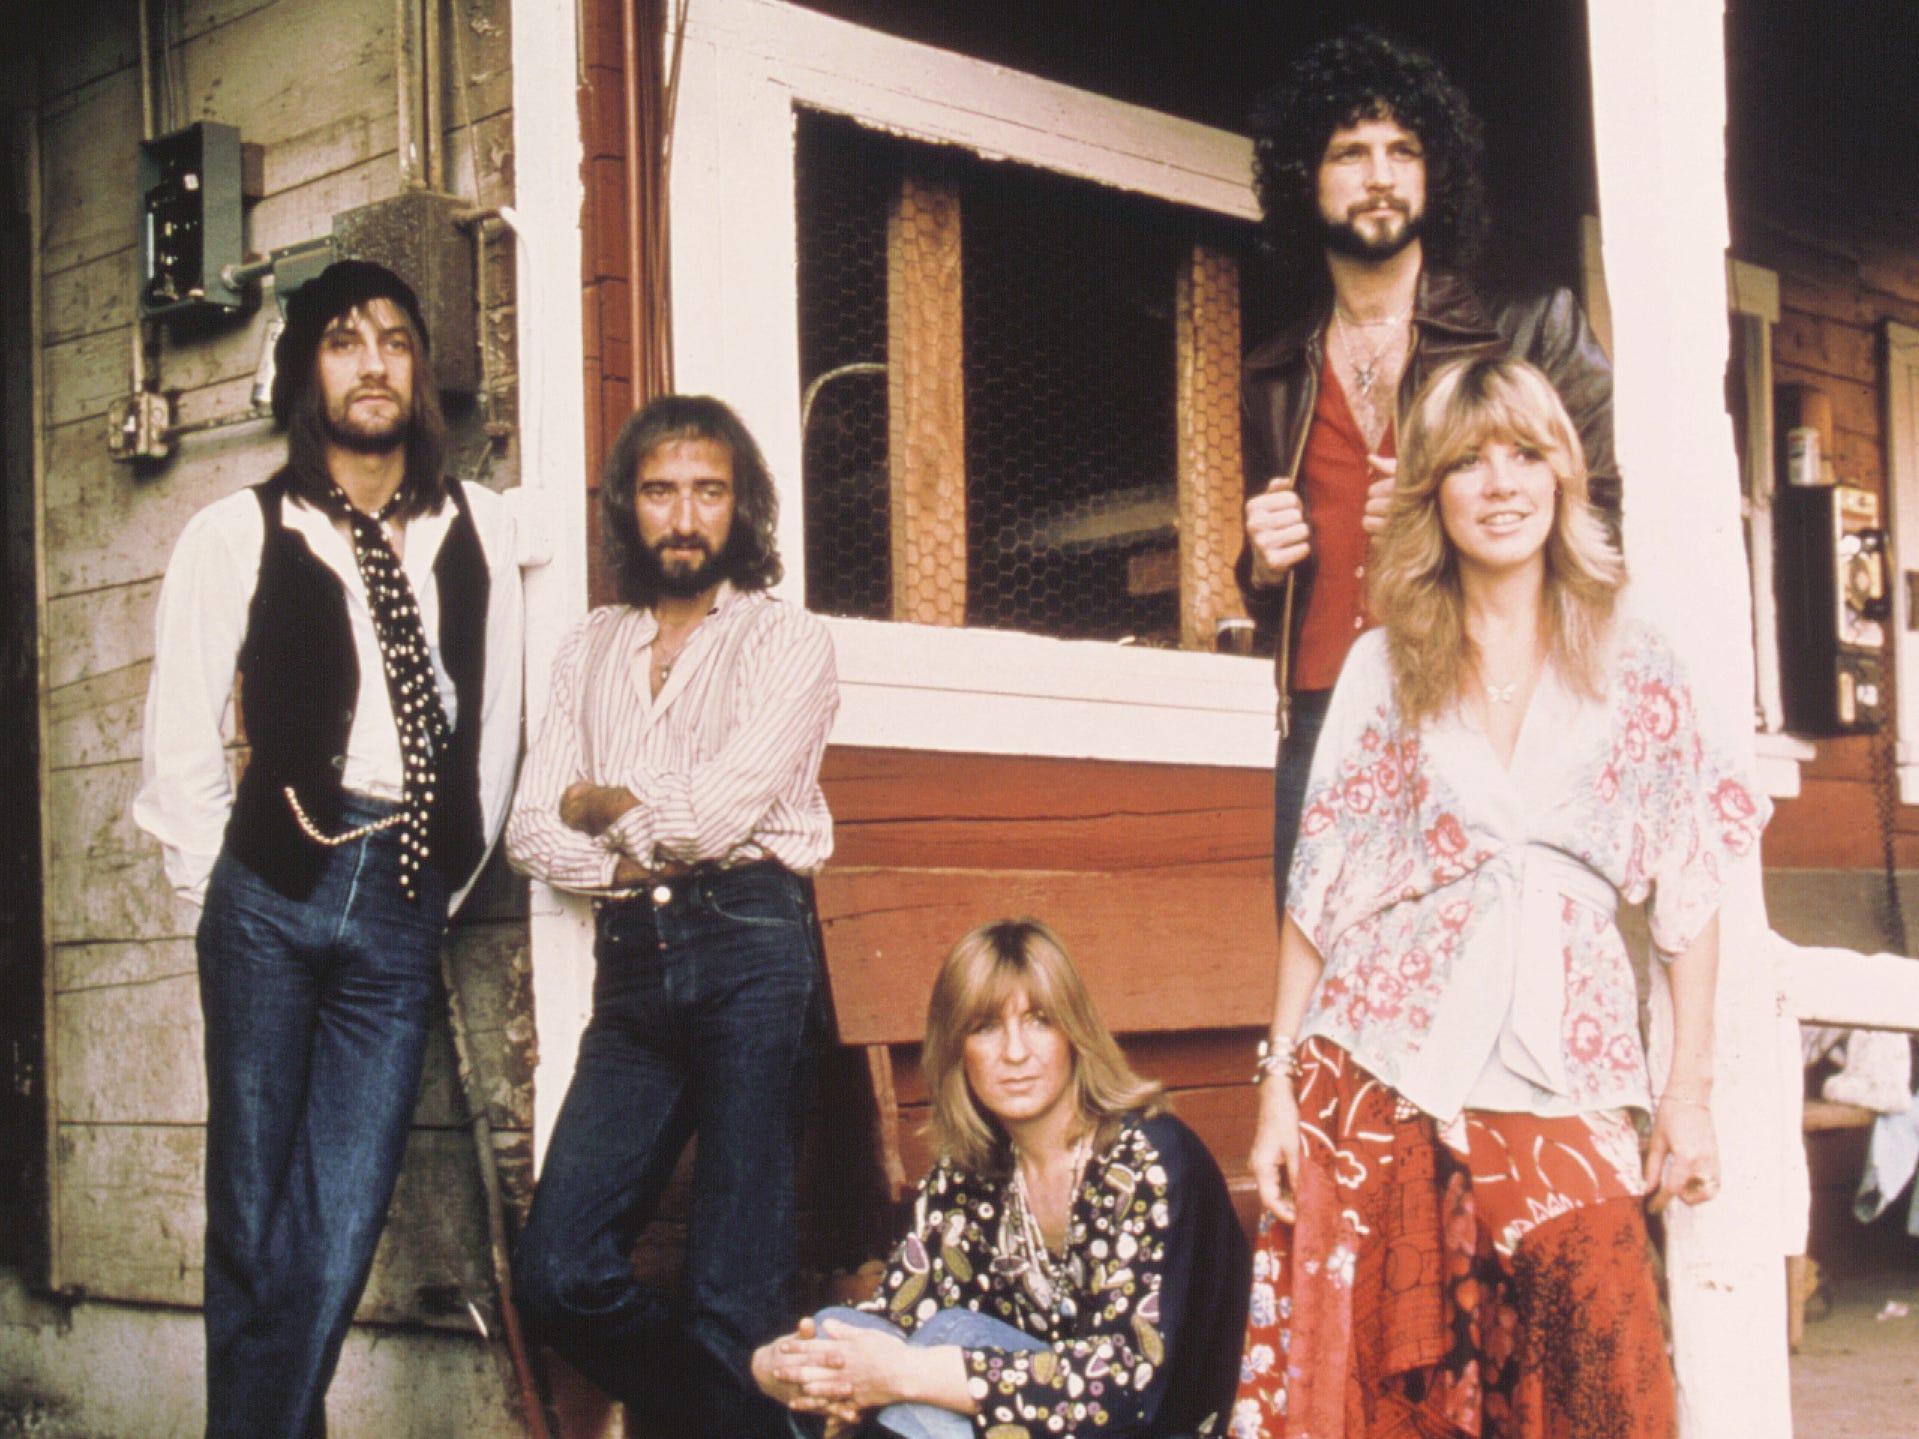 Fleetwood Mac, early 1970s.  L-R: Mick Fleetwood, John McVie, Christine McVie, Lindsay Buckingham, Stevie Nicks.